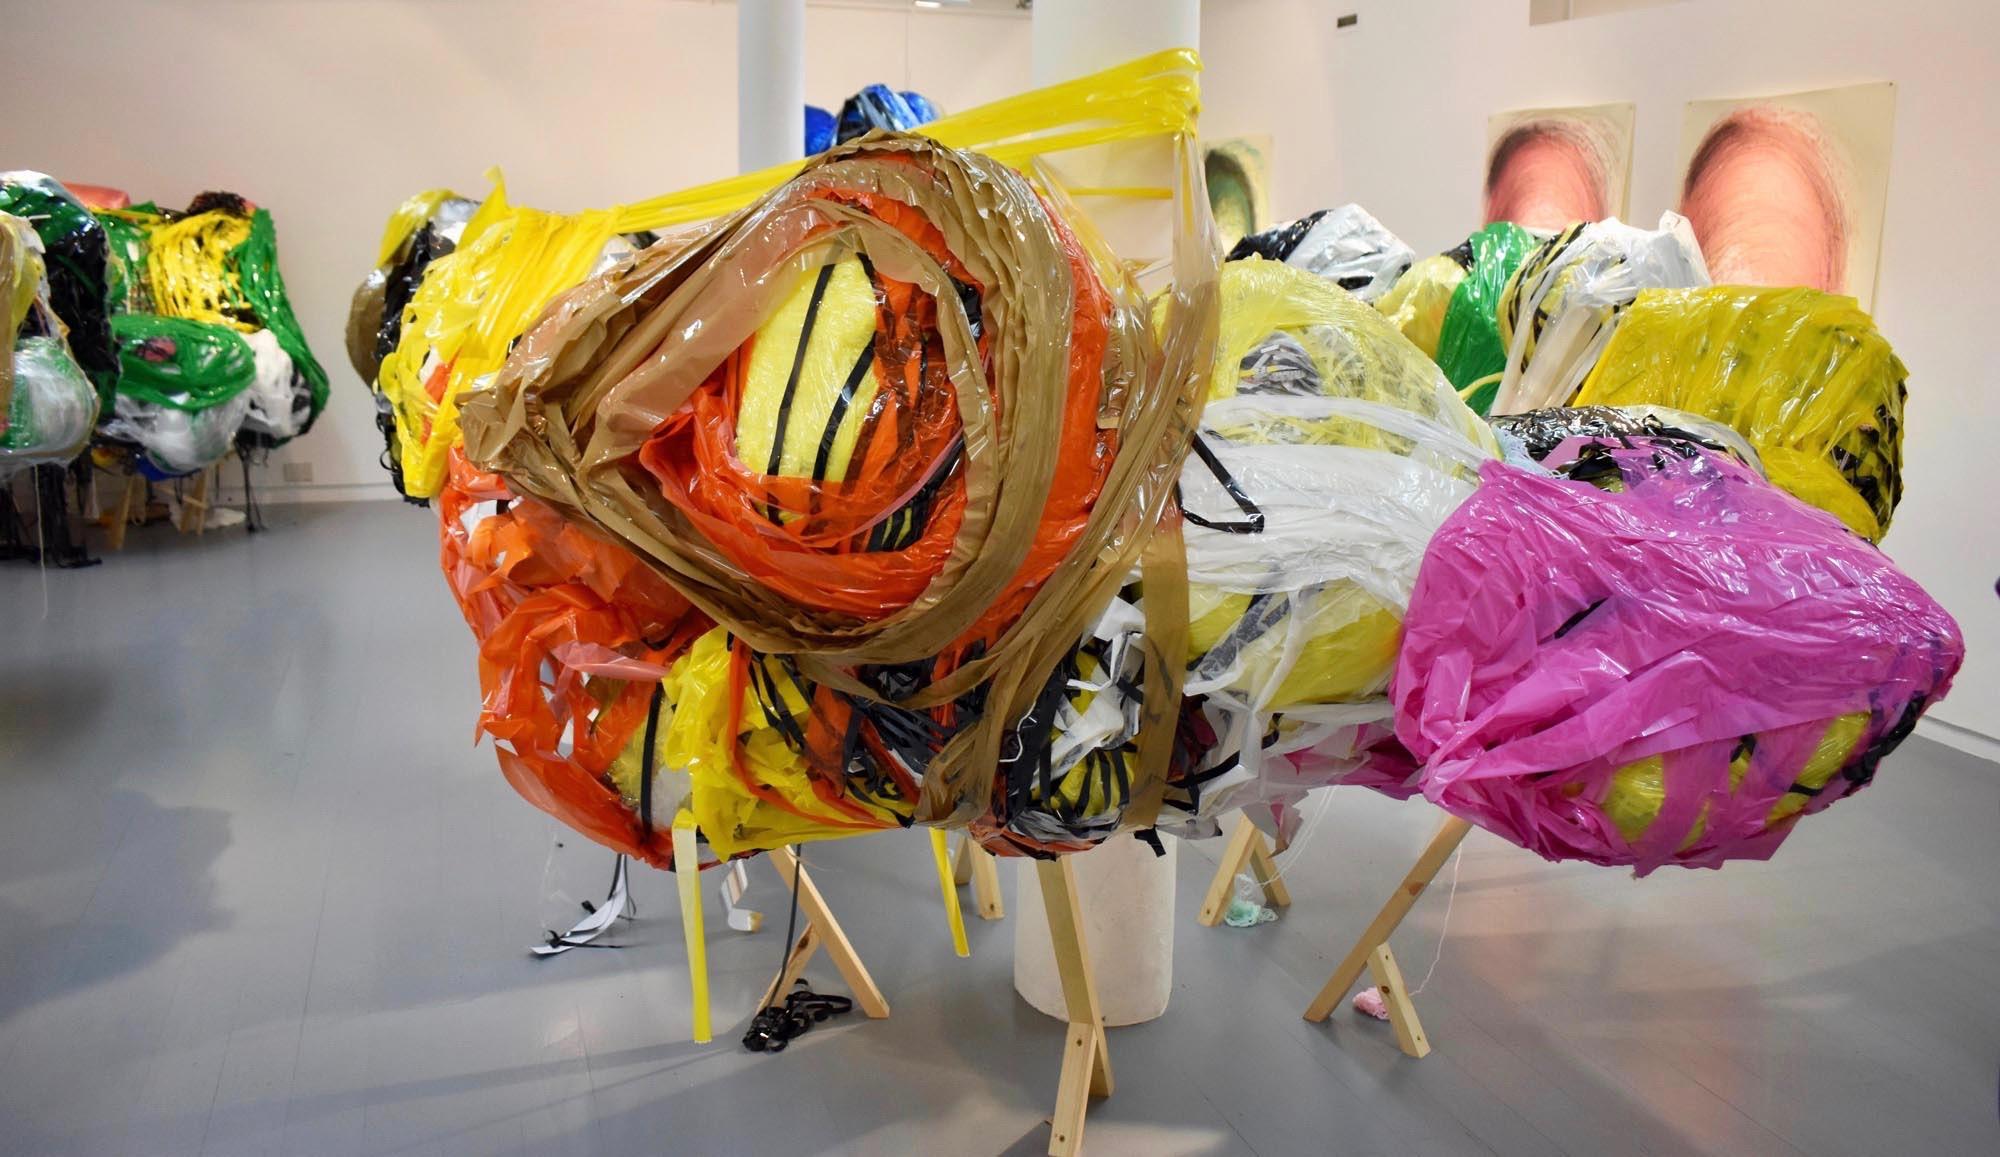 Nnena Kalu: Wrapping